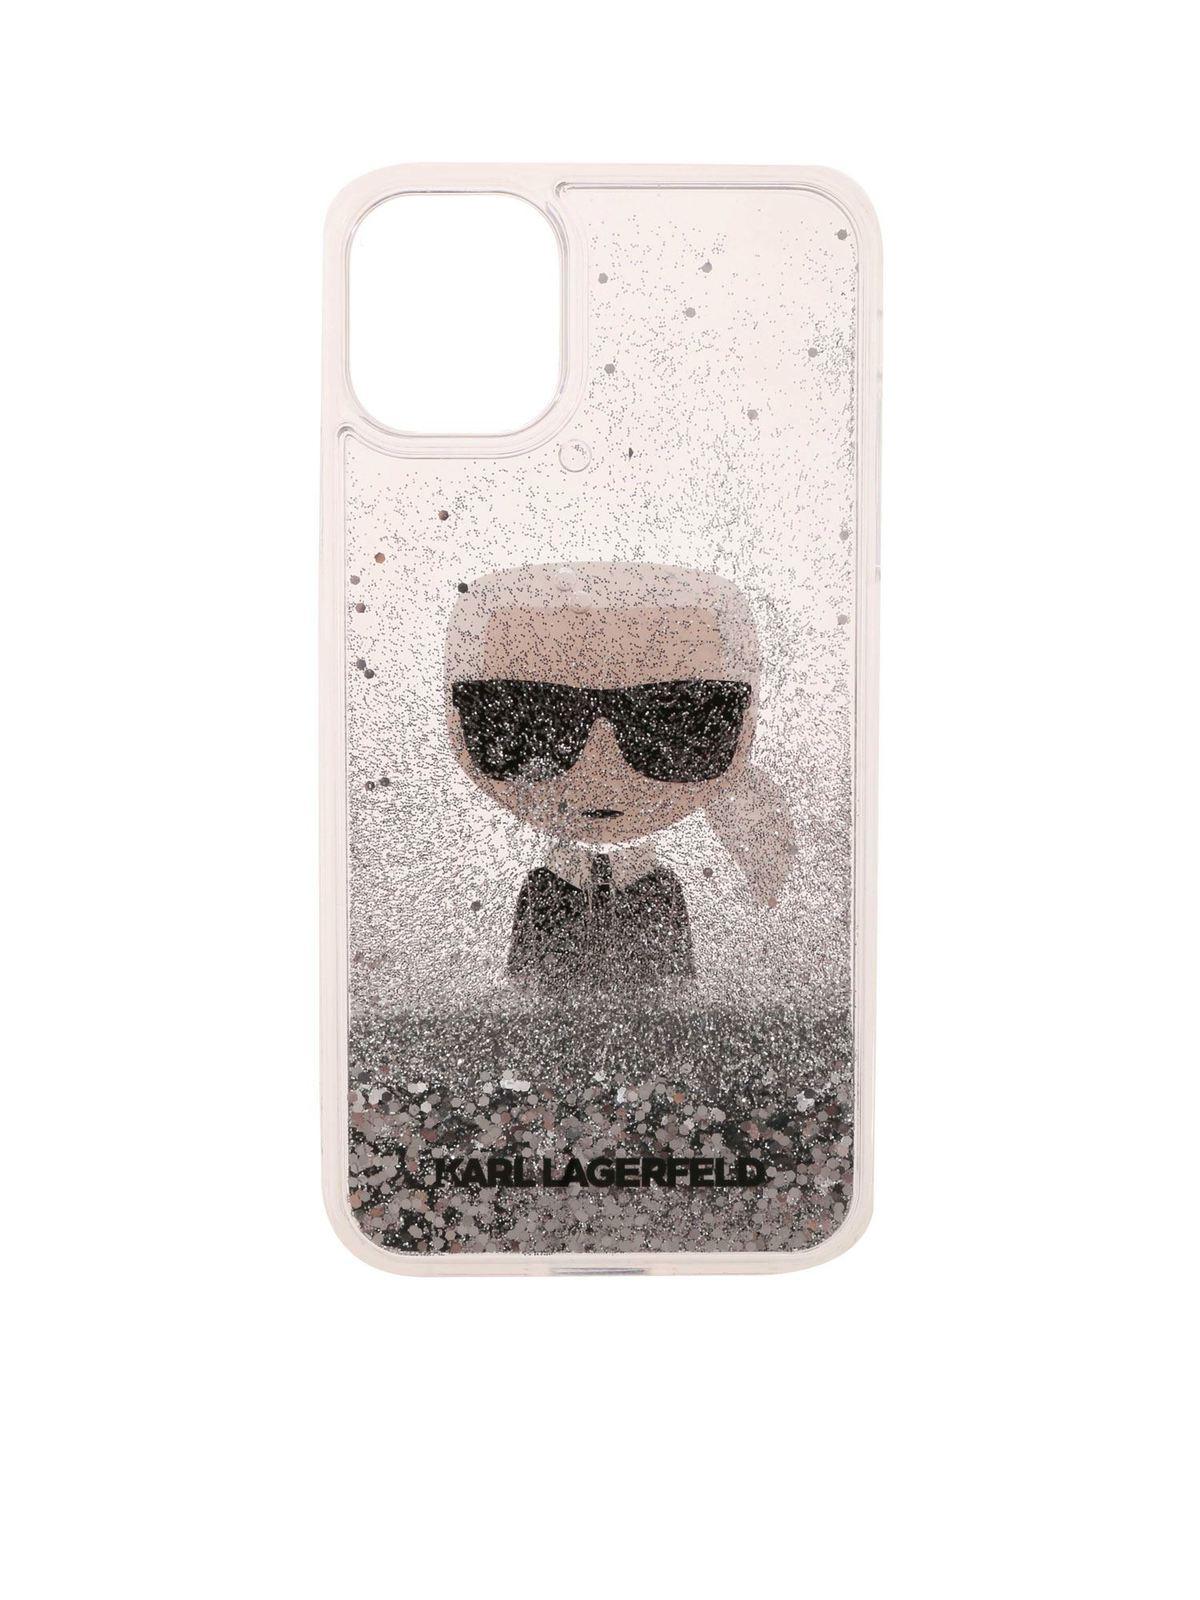 Karl Lagerfeld KIKONIC IPHONE 11 TRANSPARENT COVER